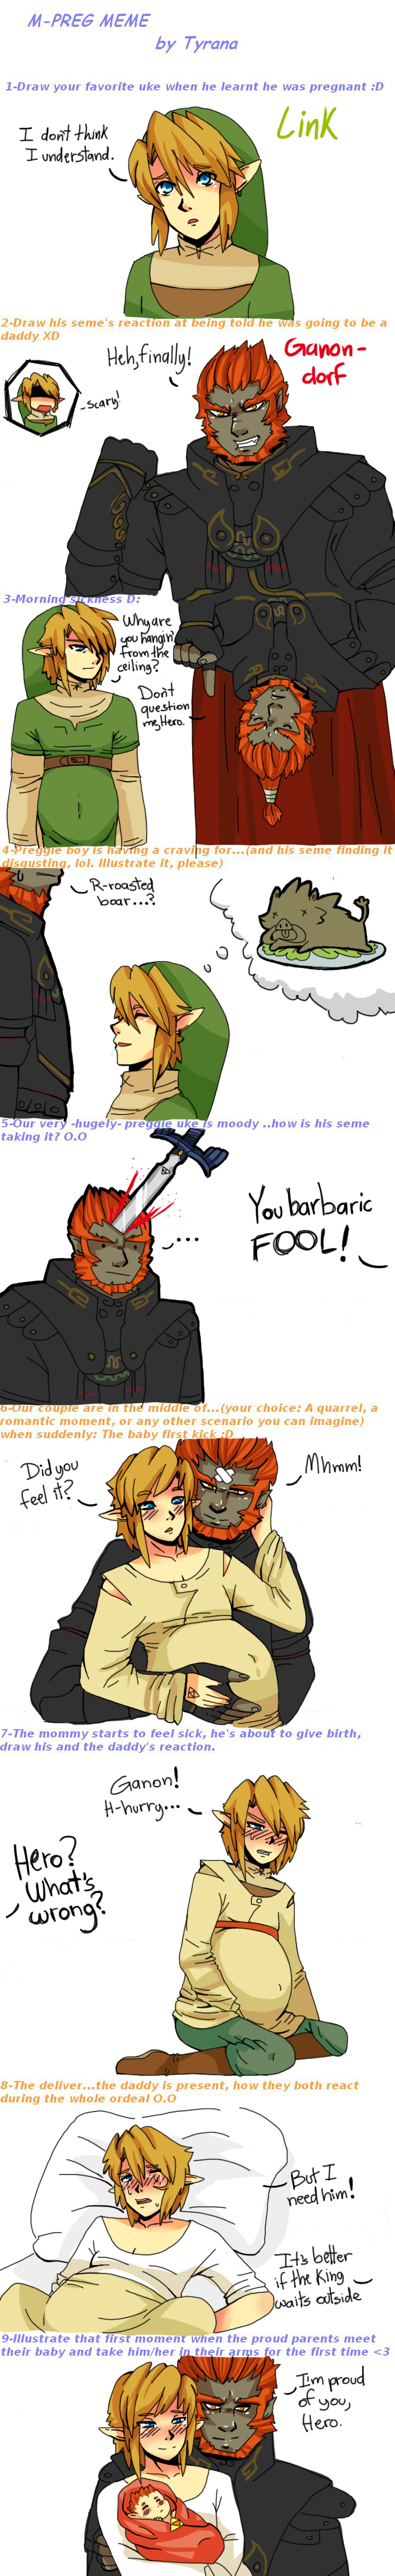 Ganondorf x Link- Mpreg meme by Ashure-Sune deviantart com